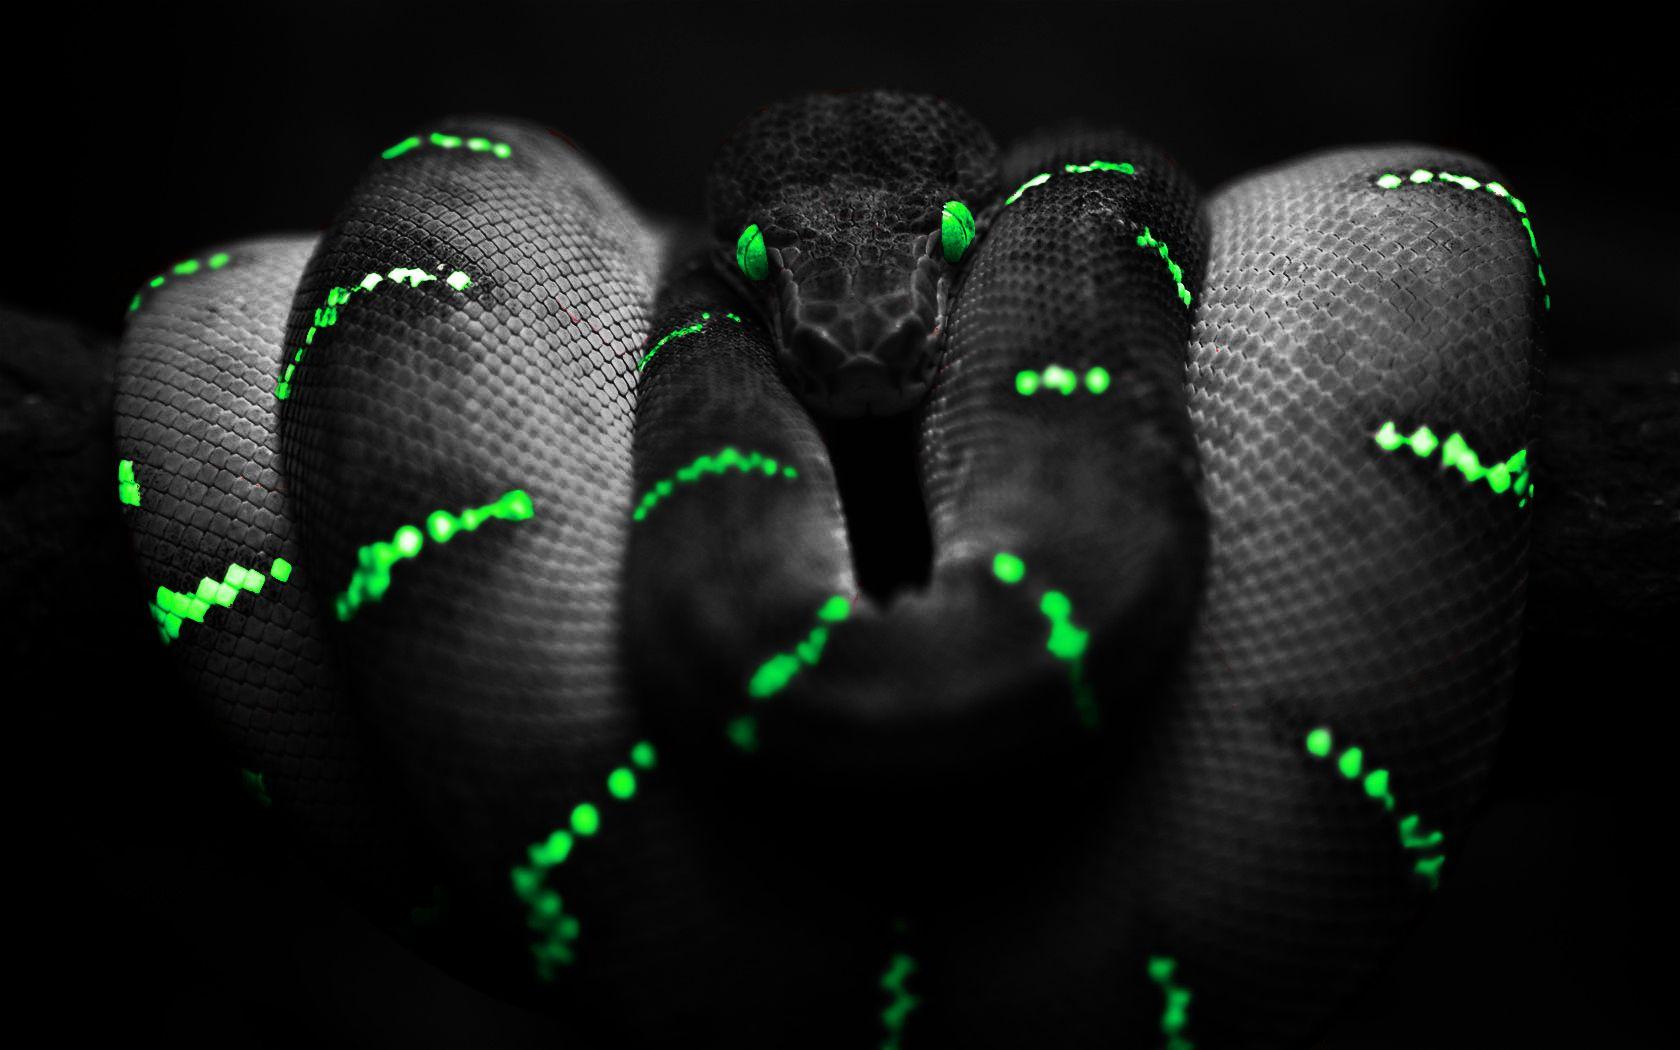 snake nature black green (With images) Snake wallpaper